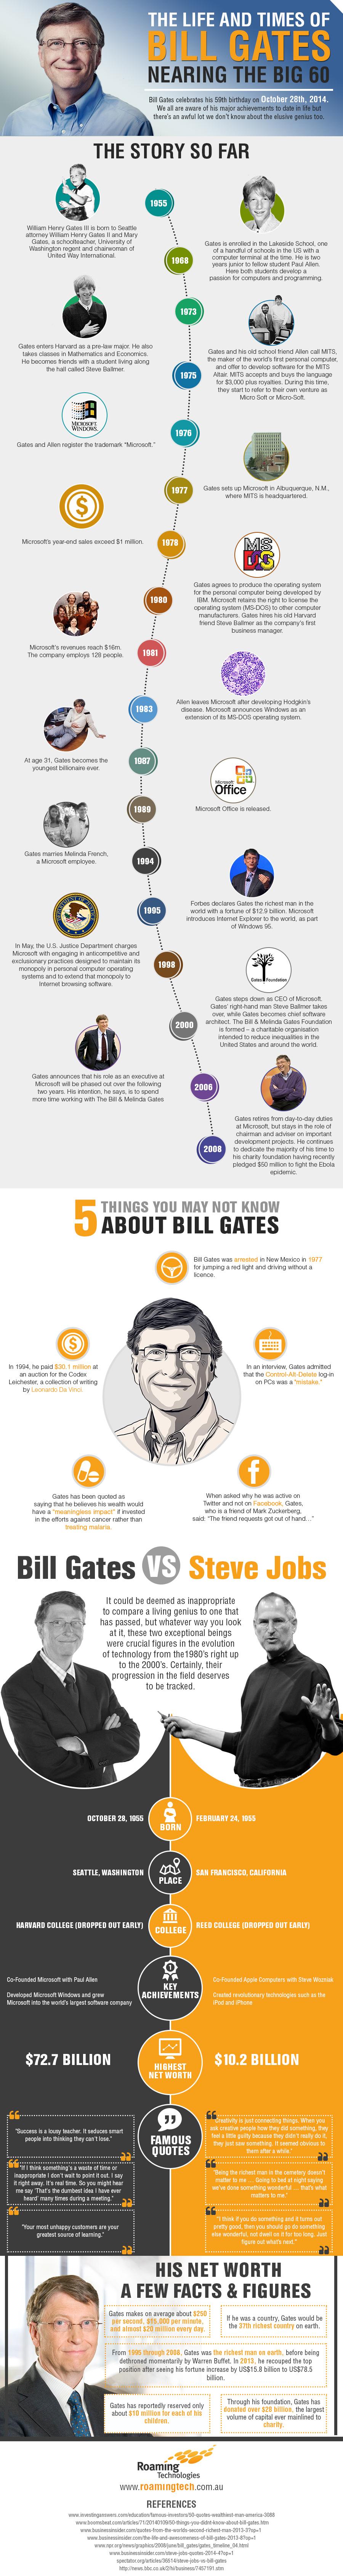 Roaming Technologies IG Bill Gates